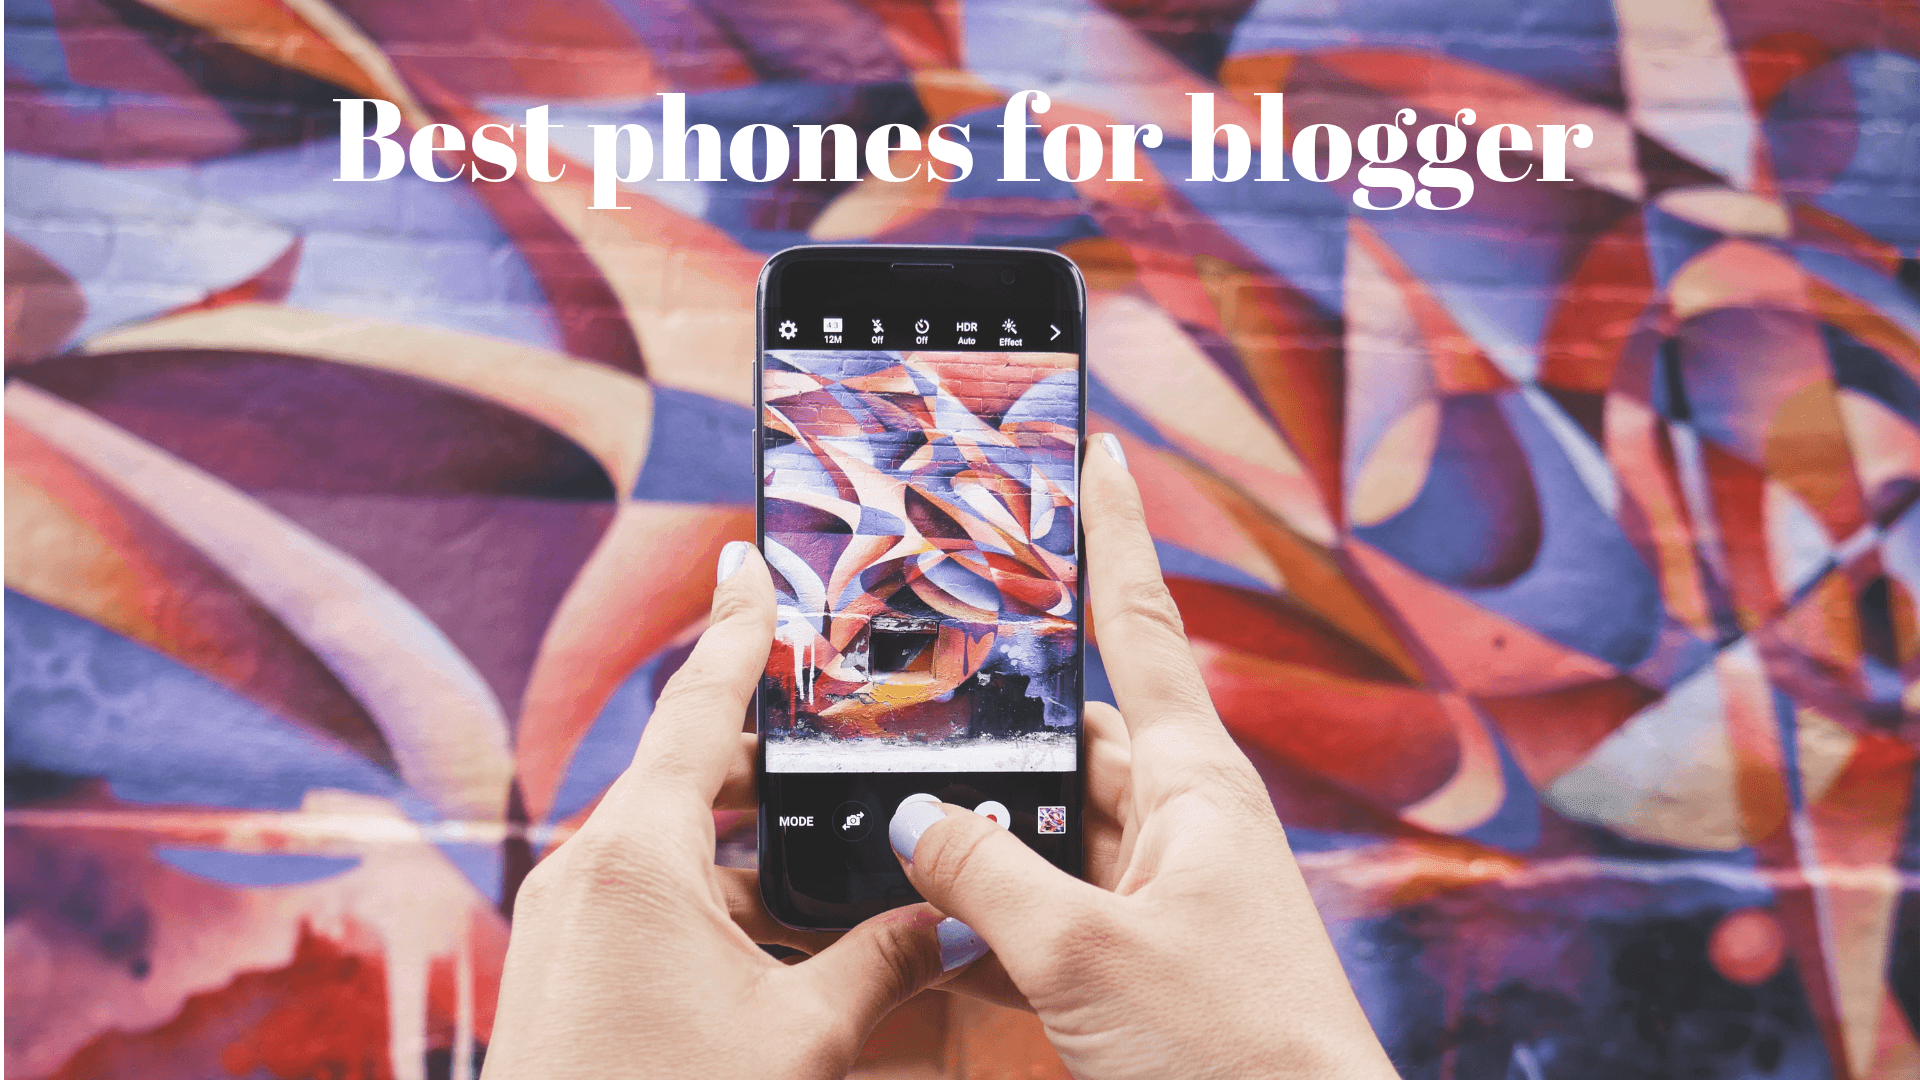 Best phones for blogger